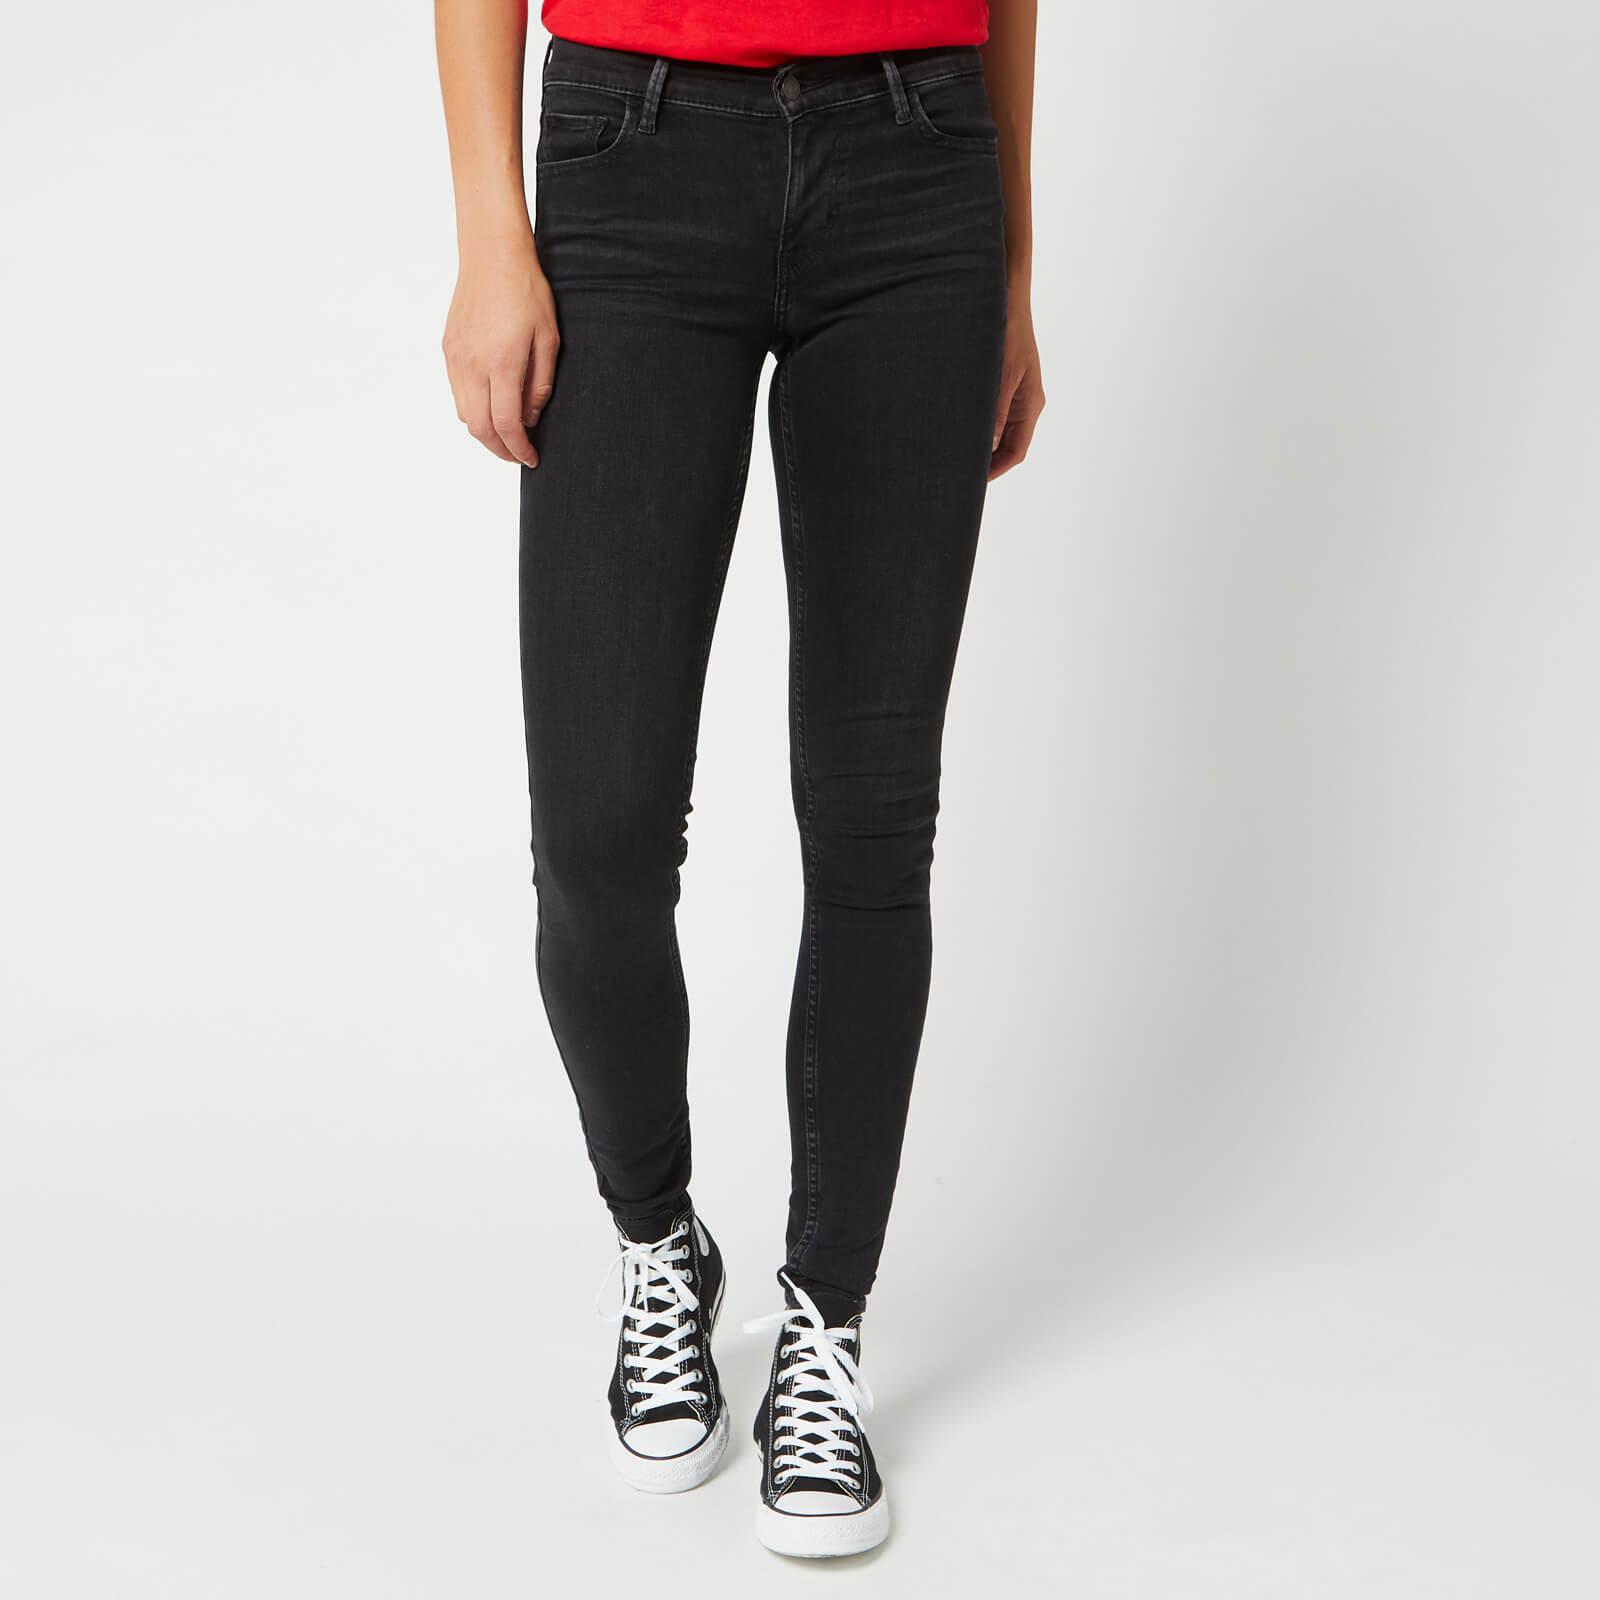 Levi's s Innovation Super Skinny Jeans - Freak Out - W29/L32